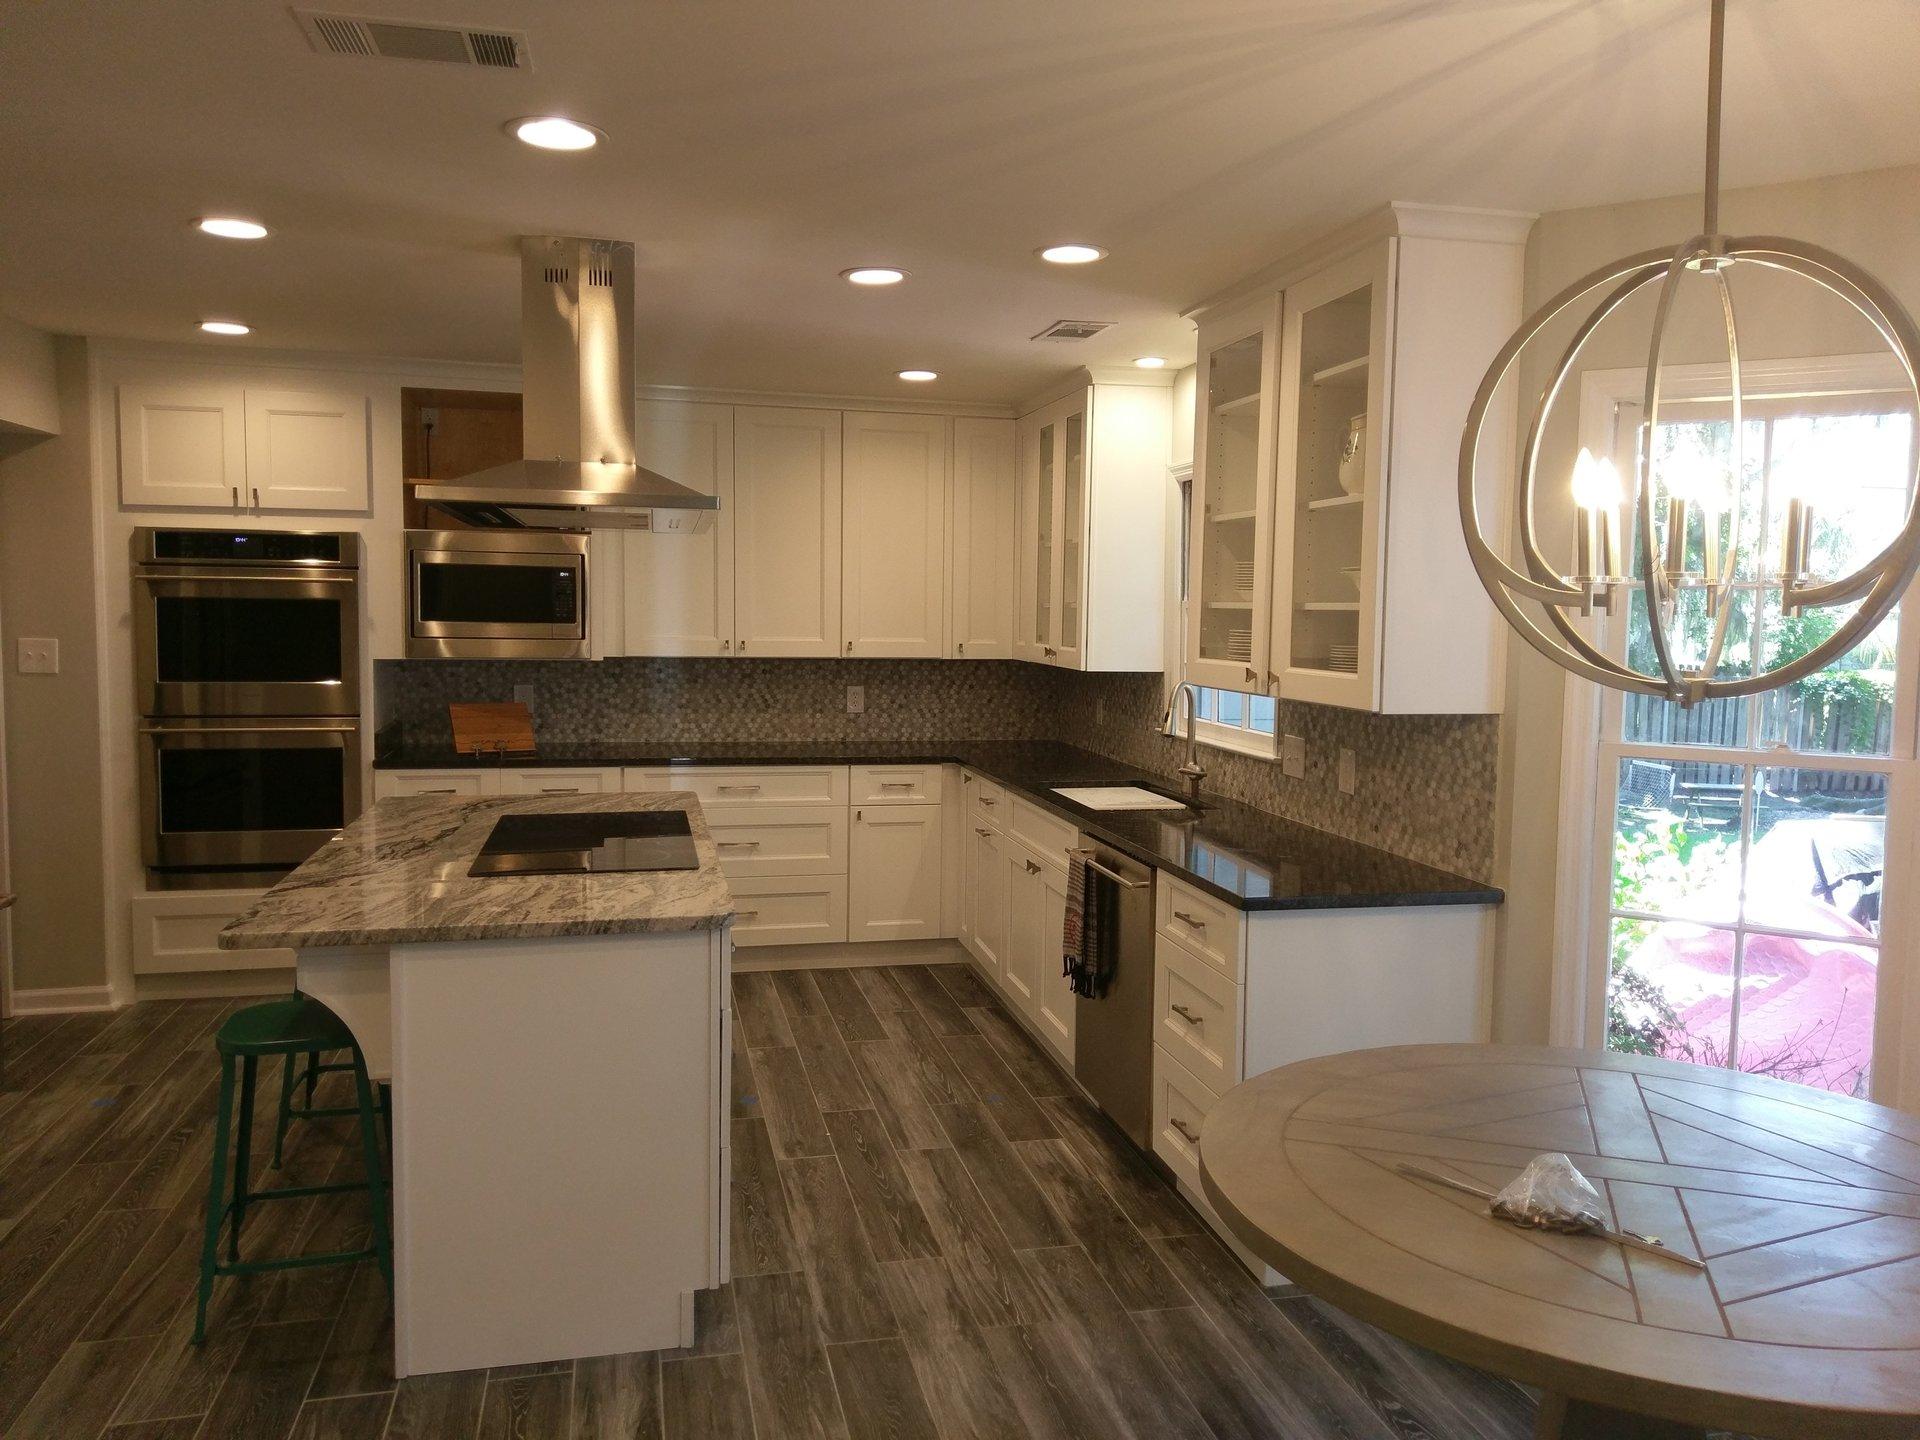 Hardwood Flooring With White Cabinets In Savannah GA